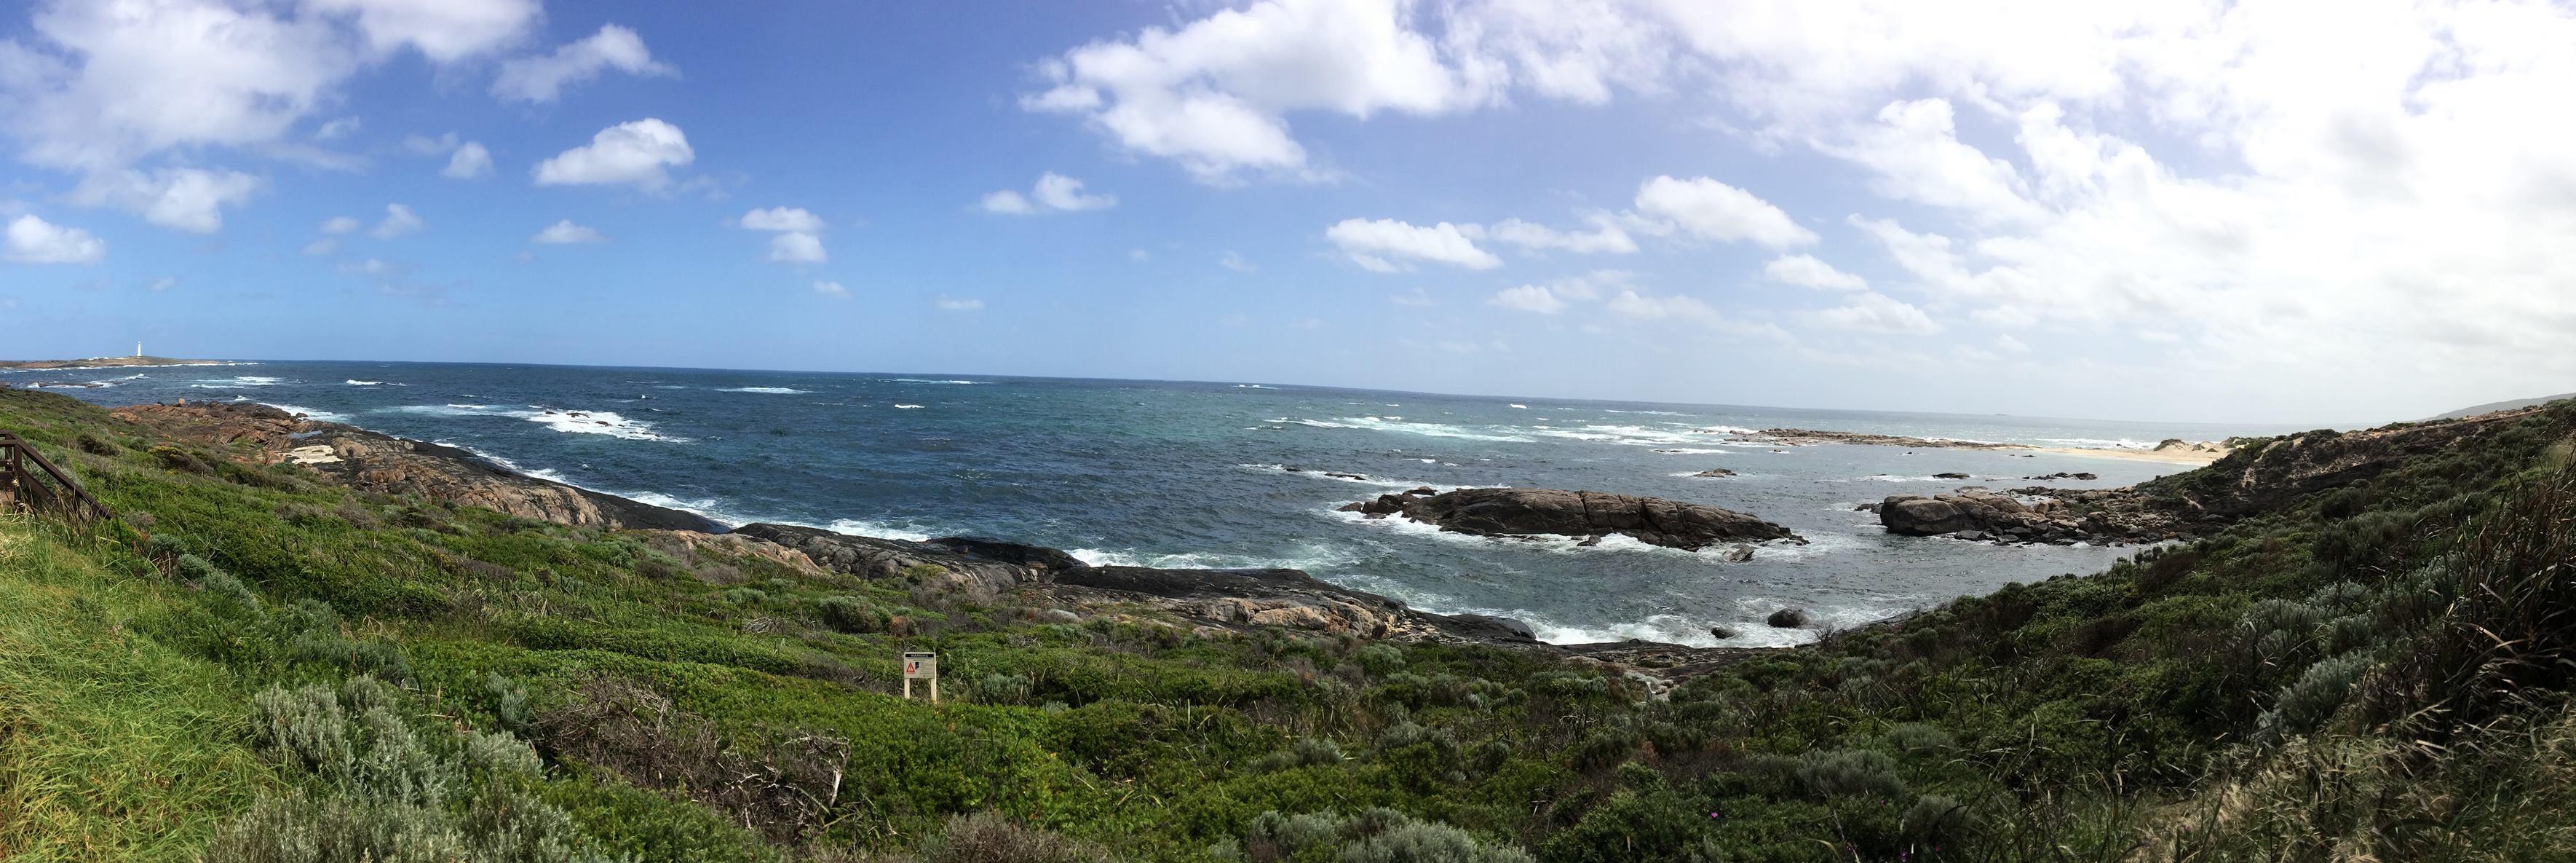 secret location for a beach wedding Augusta